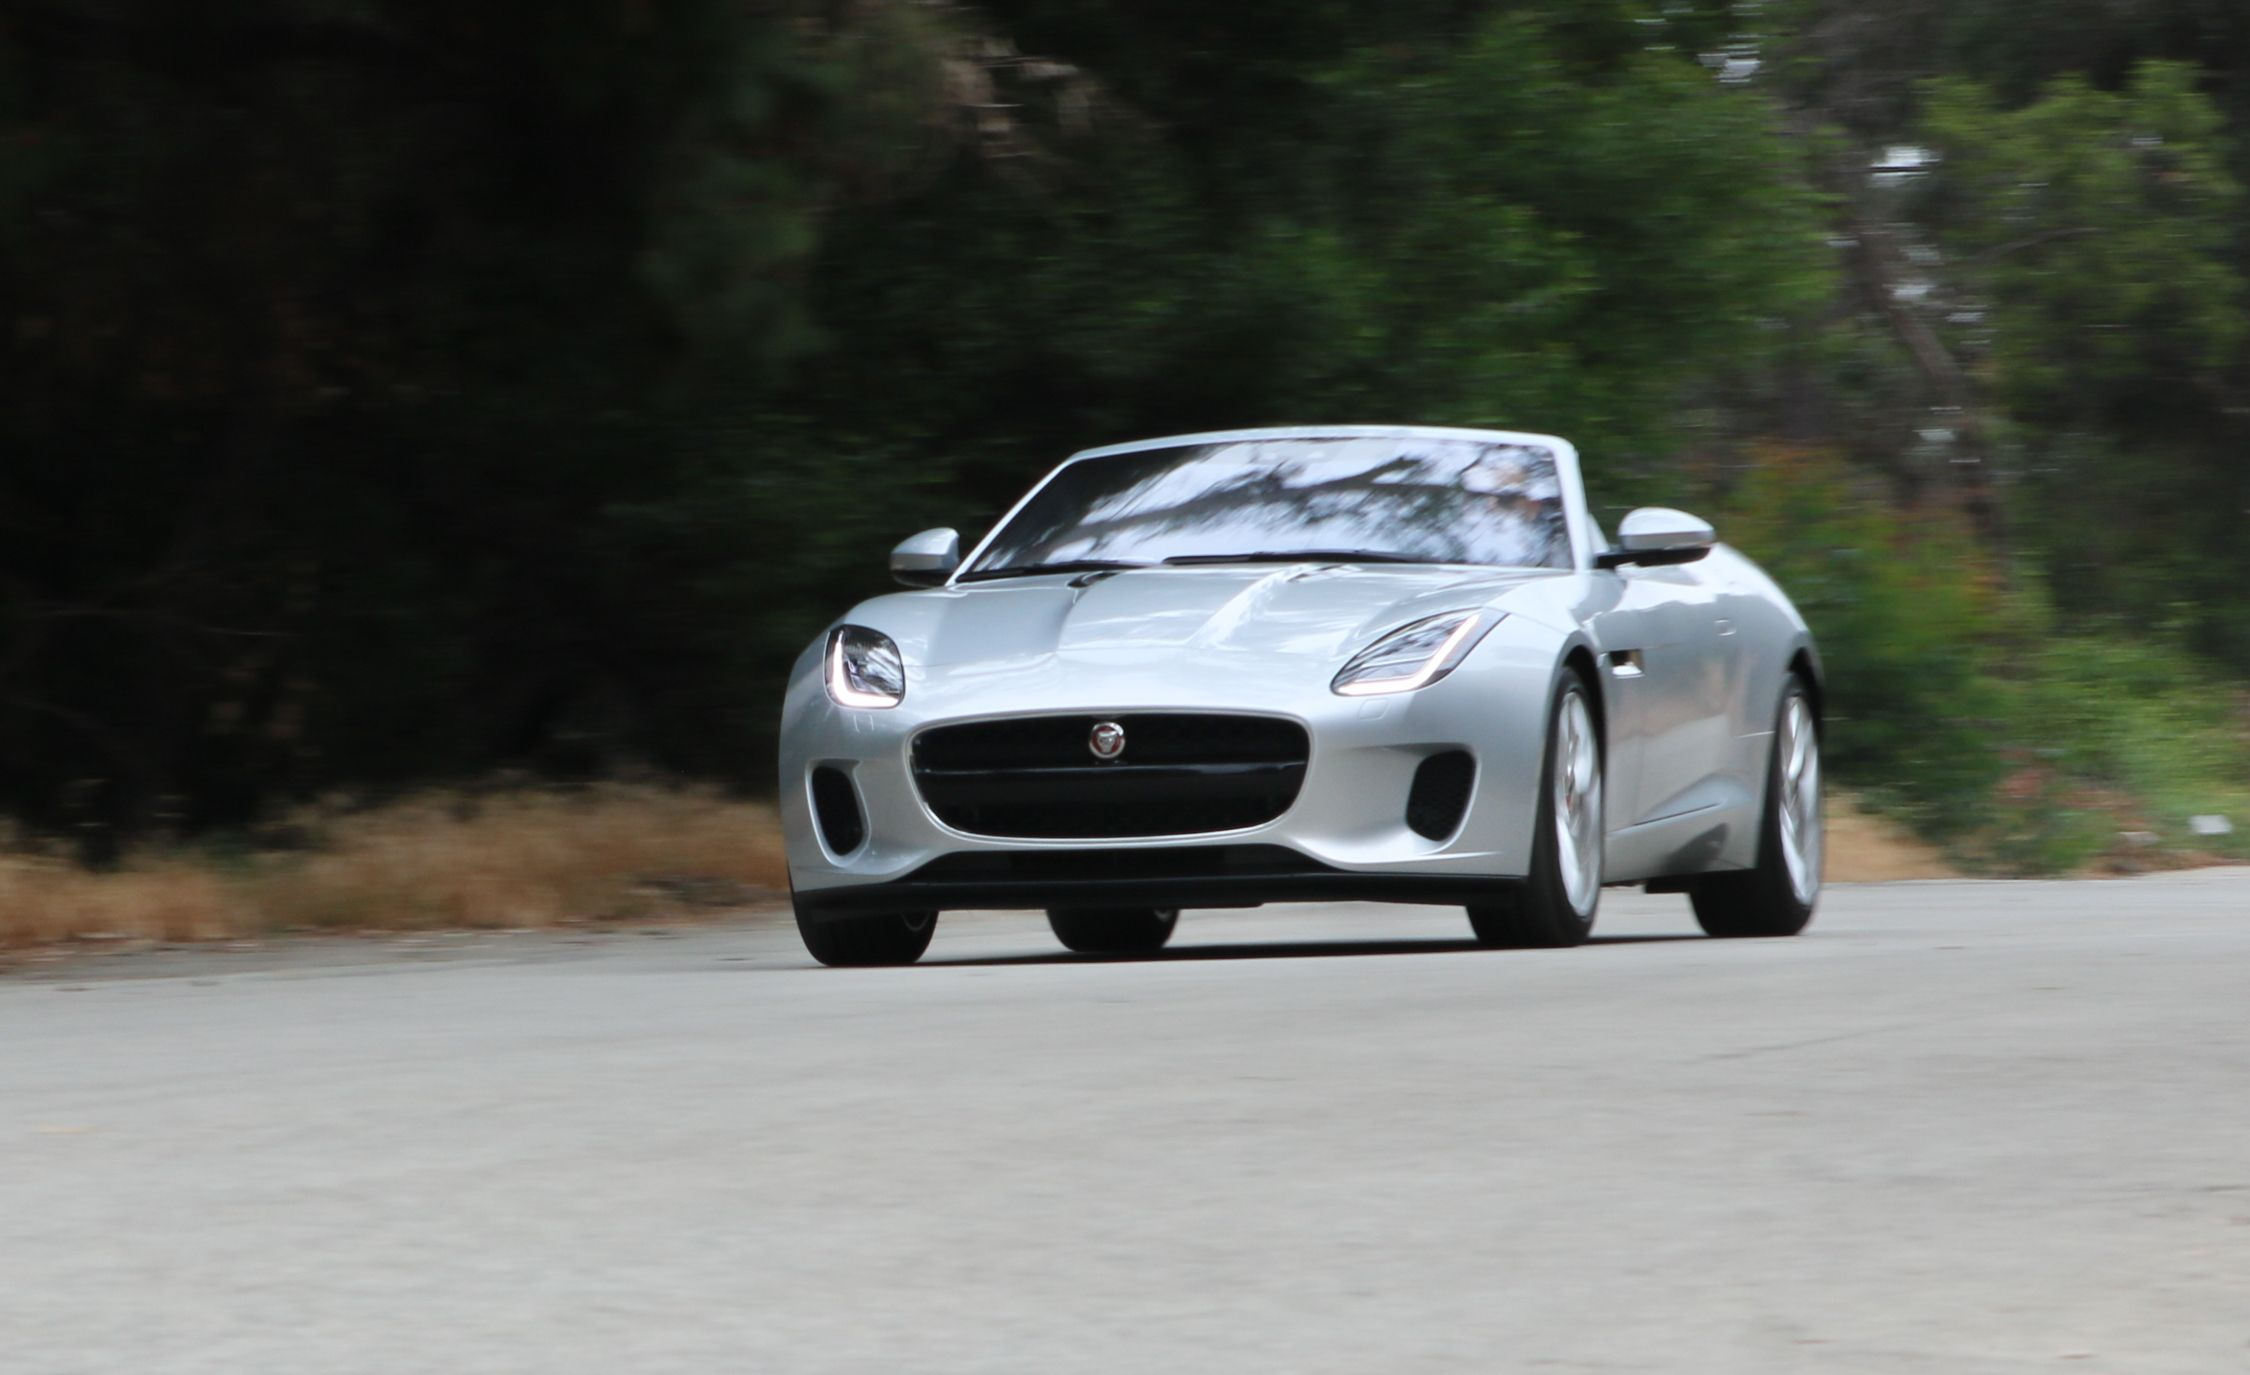 2018 Jaguar F-Type 2.0T